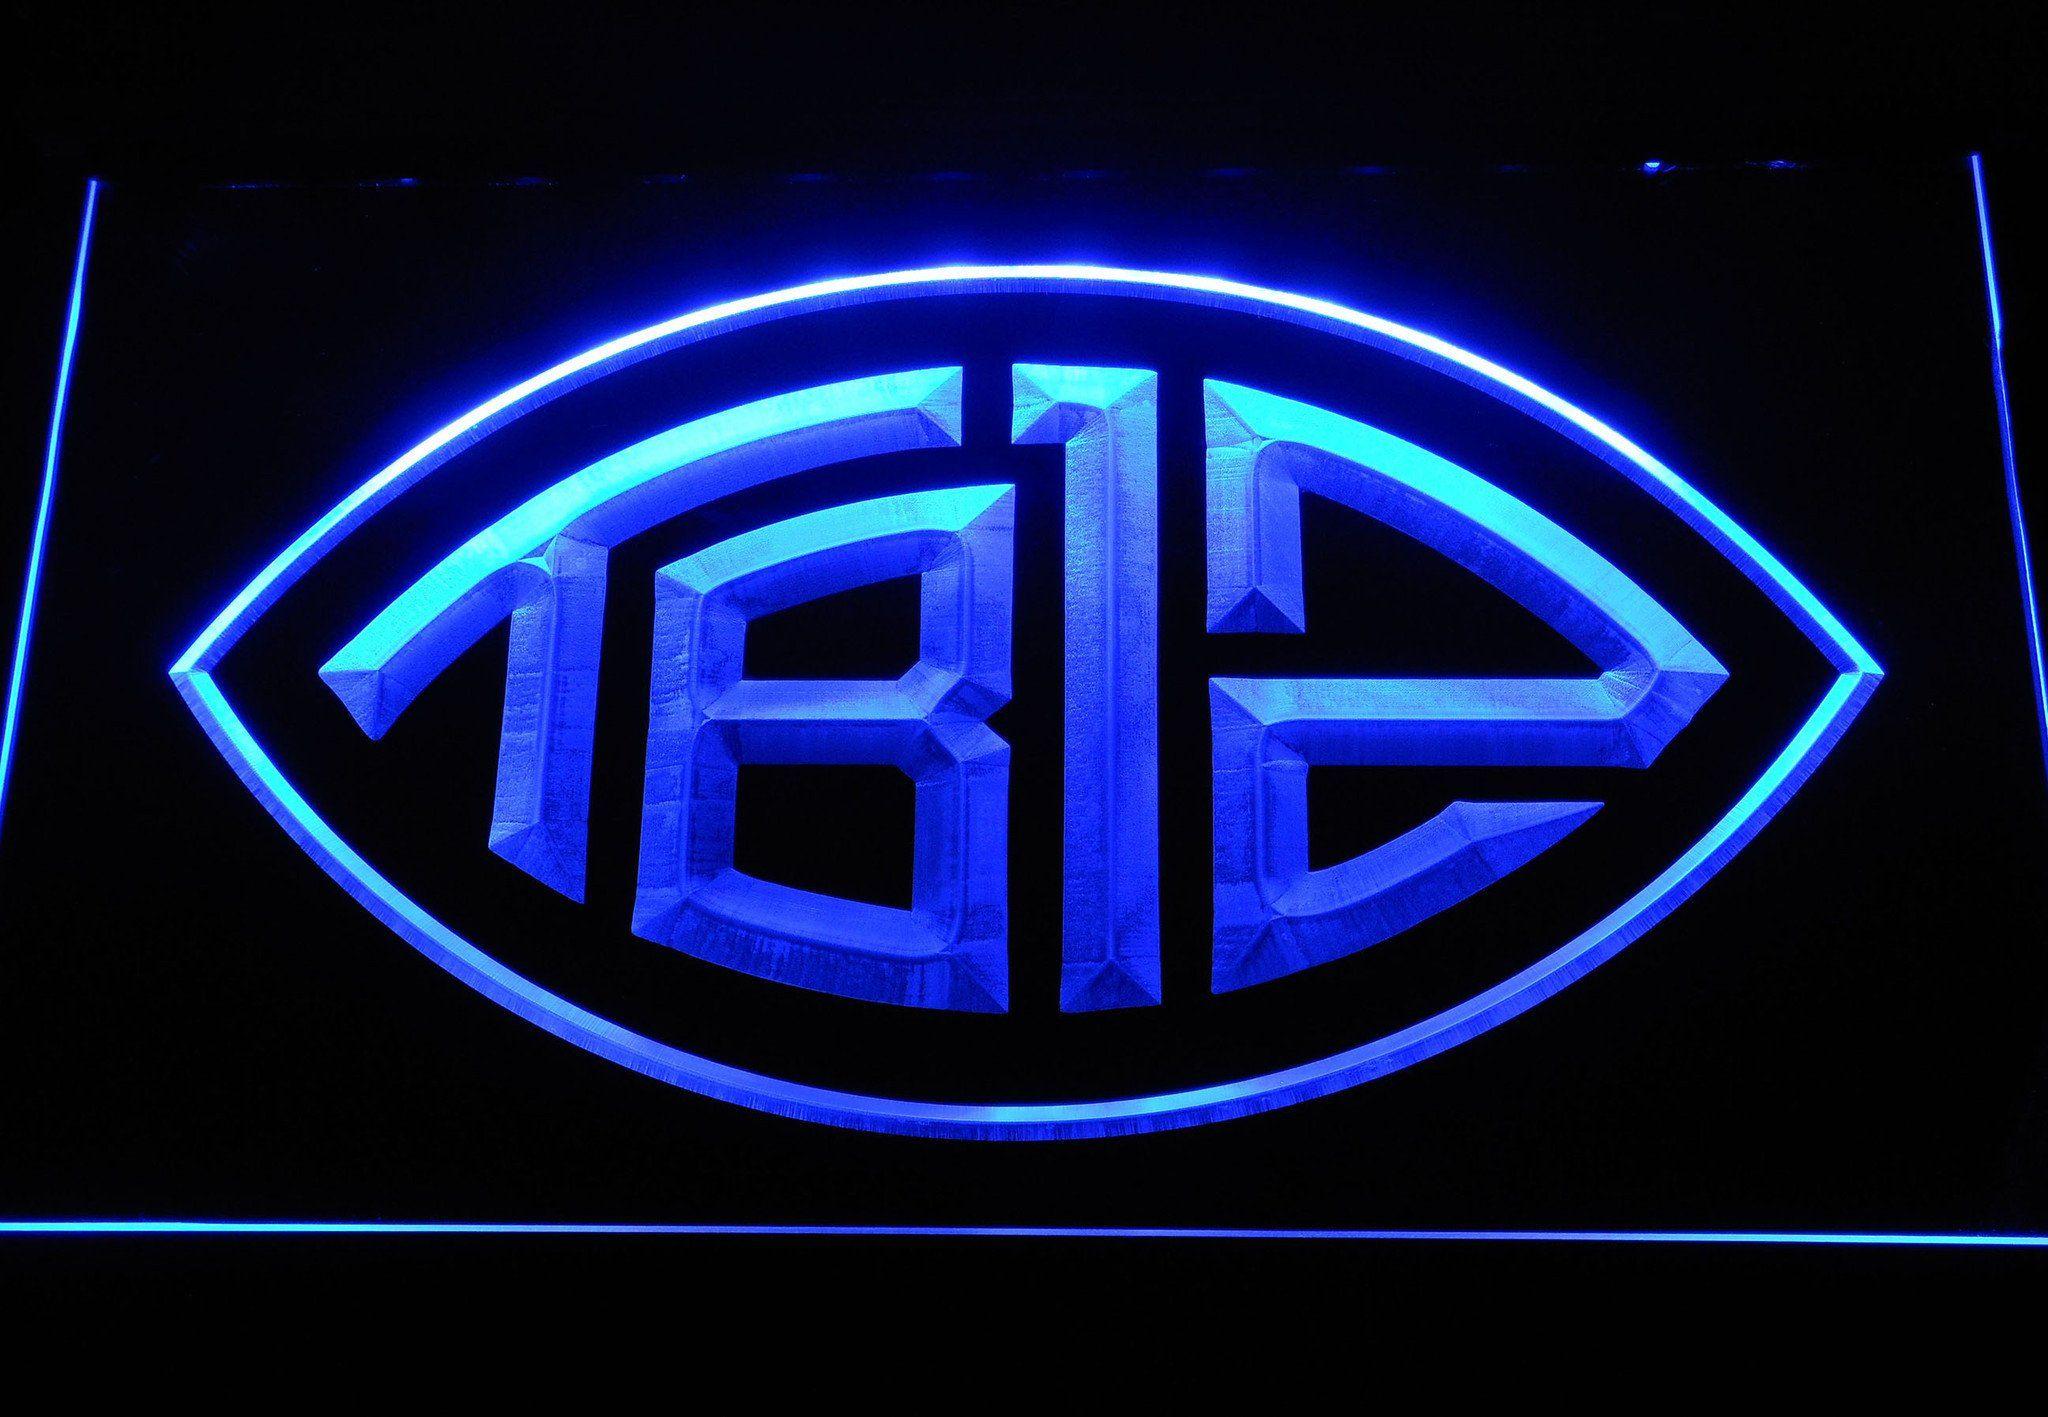 New england patriots tom brady football logo led neon sign